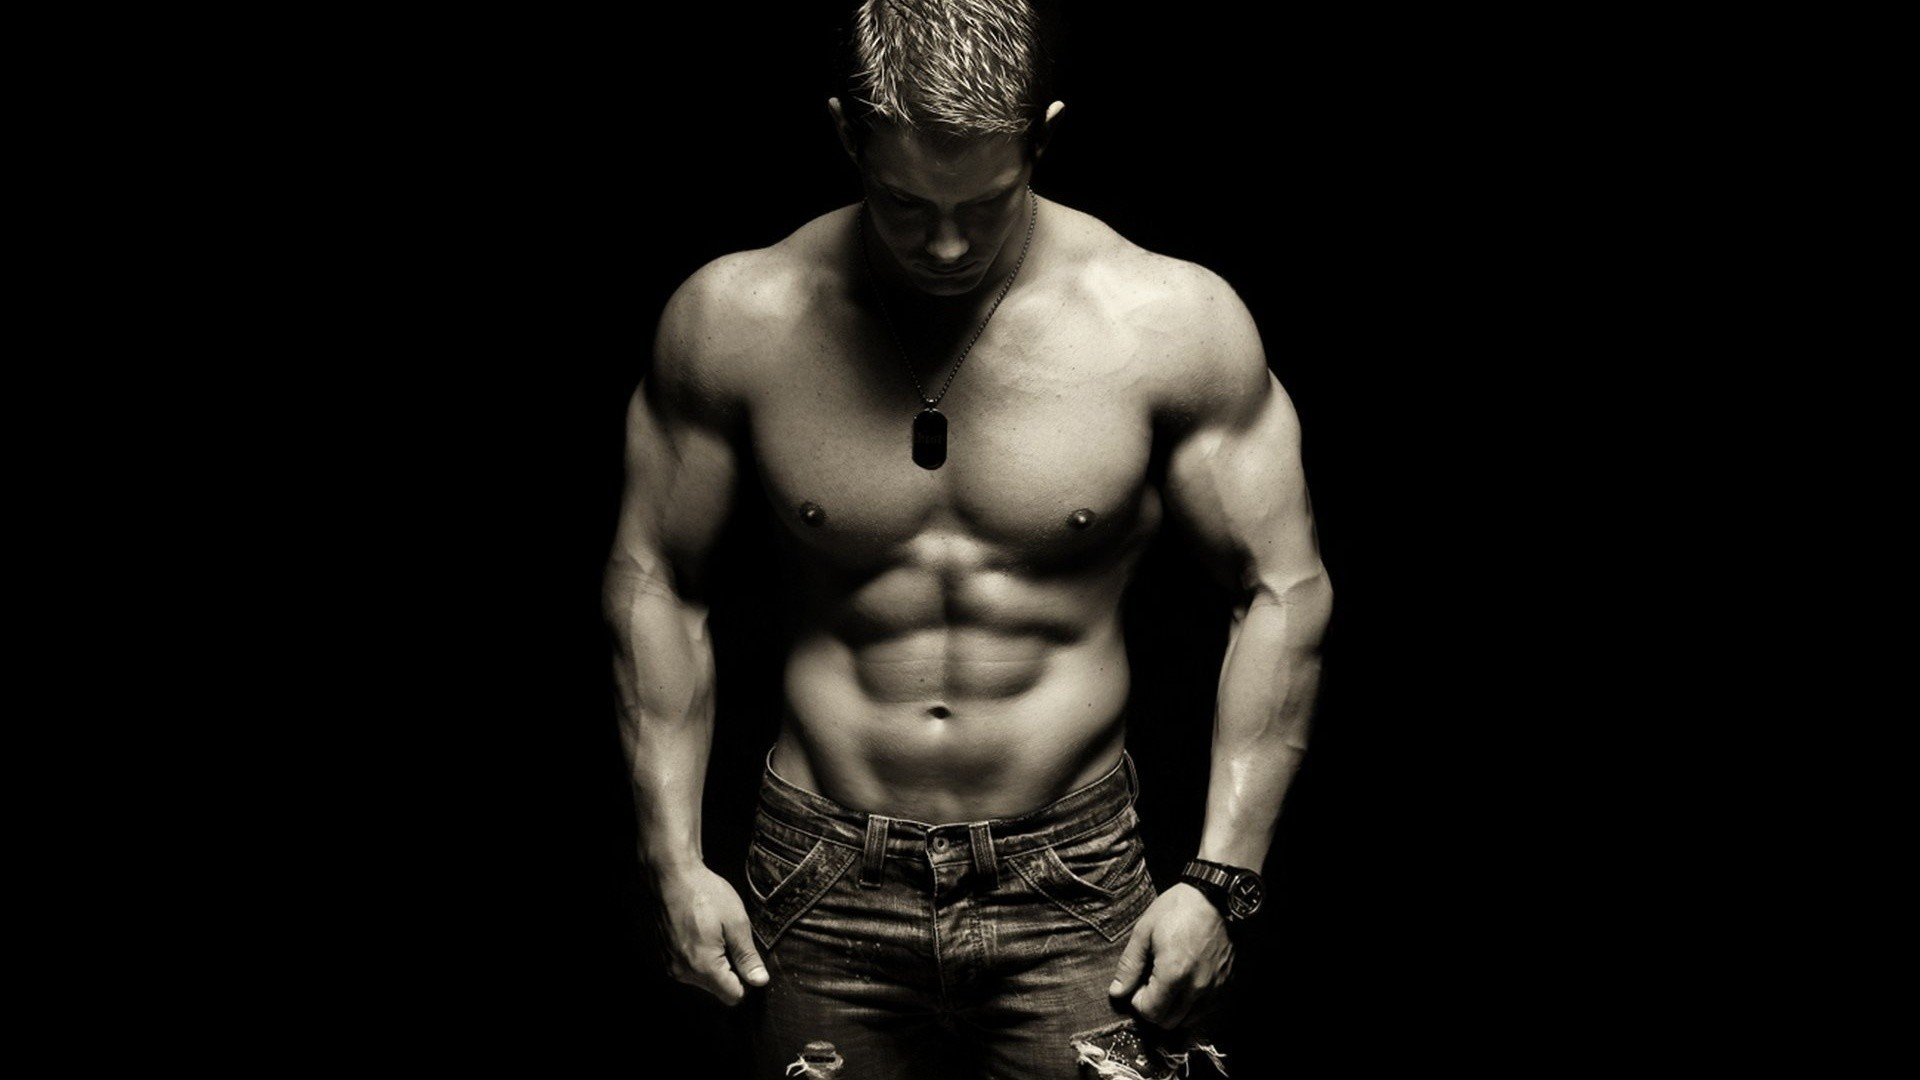 1920x1080 Muscles Uncle Bob Man Hunk Bodybuilder